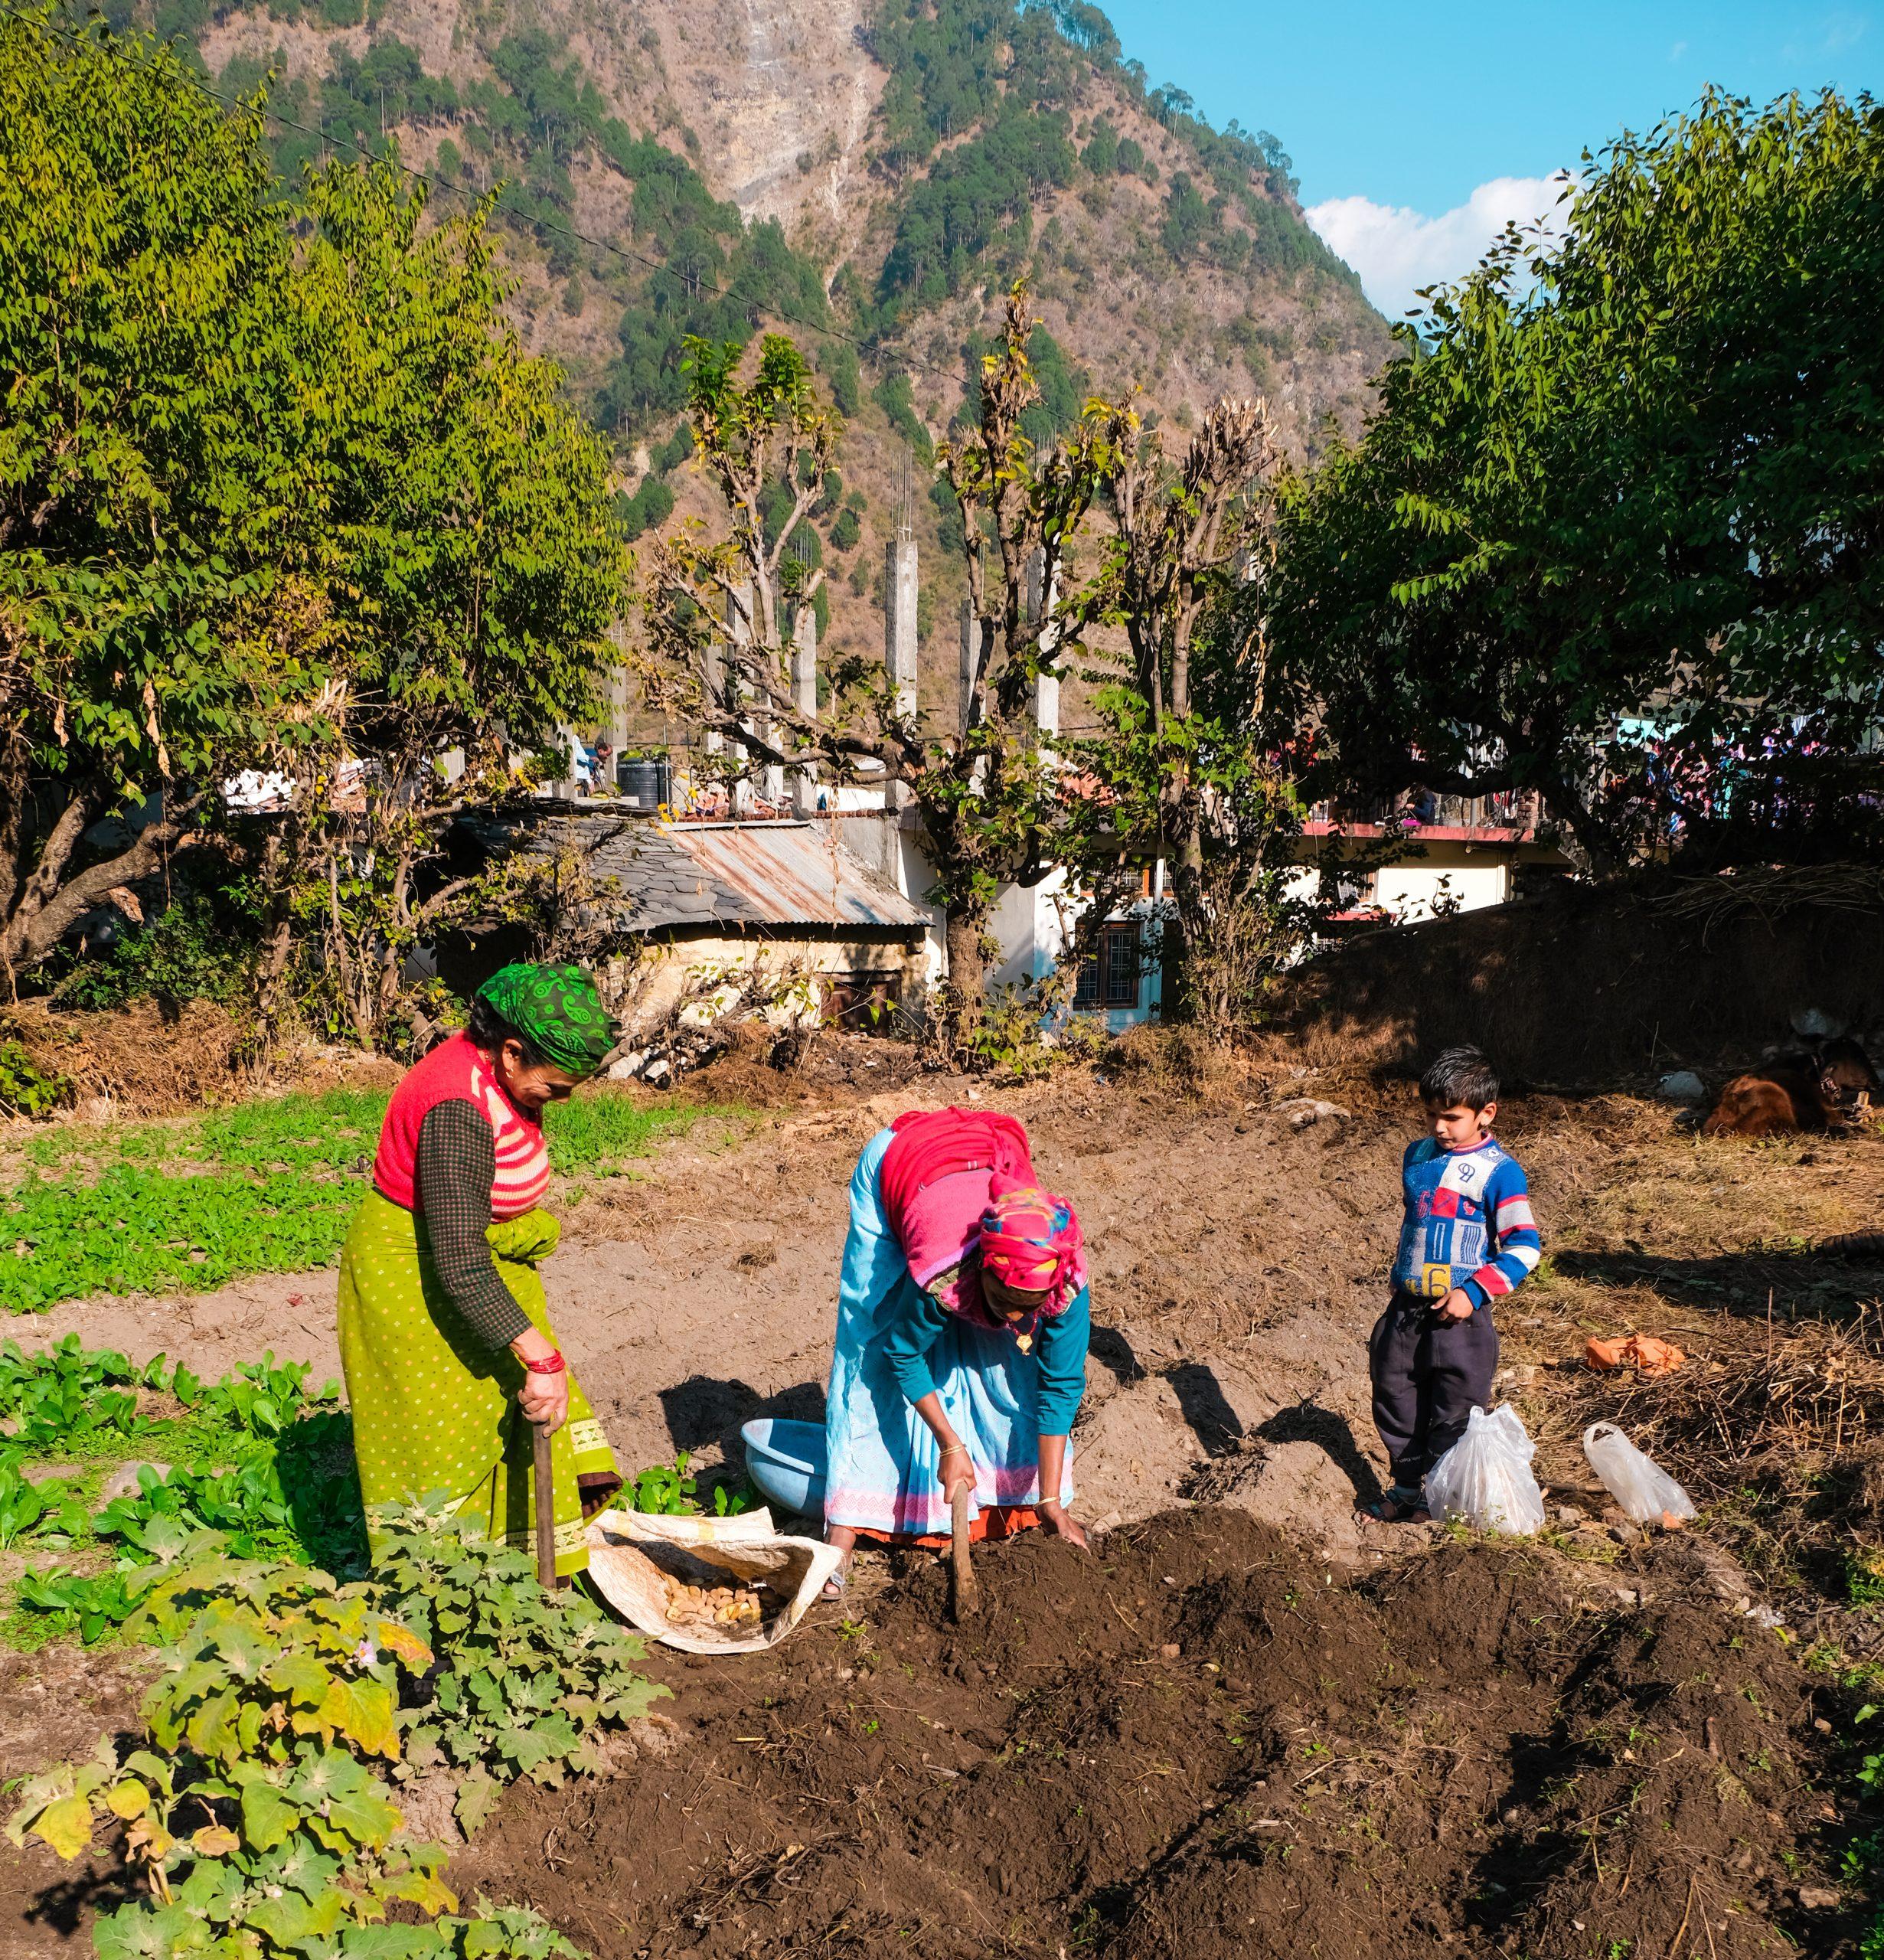 Mountain farmers working